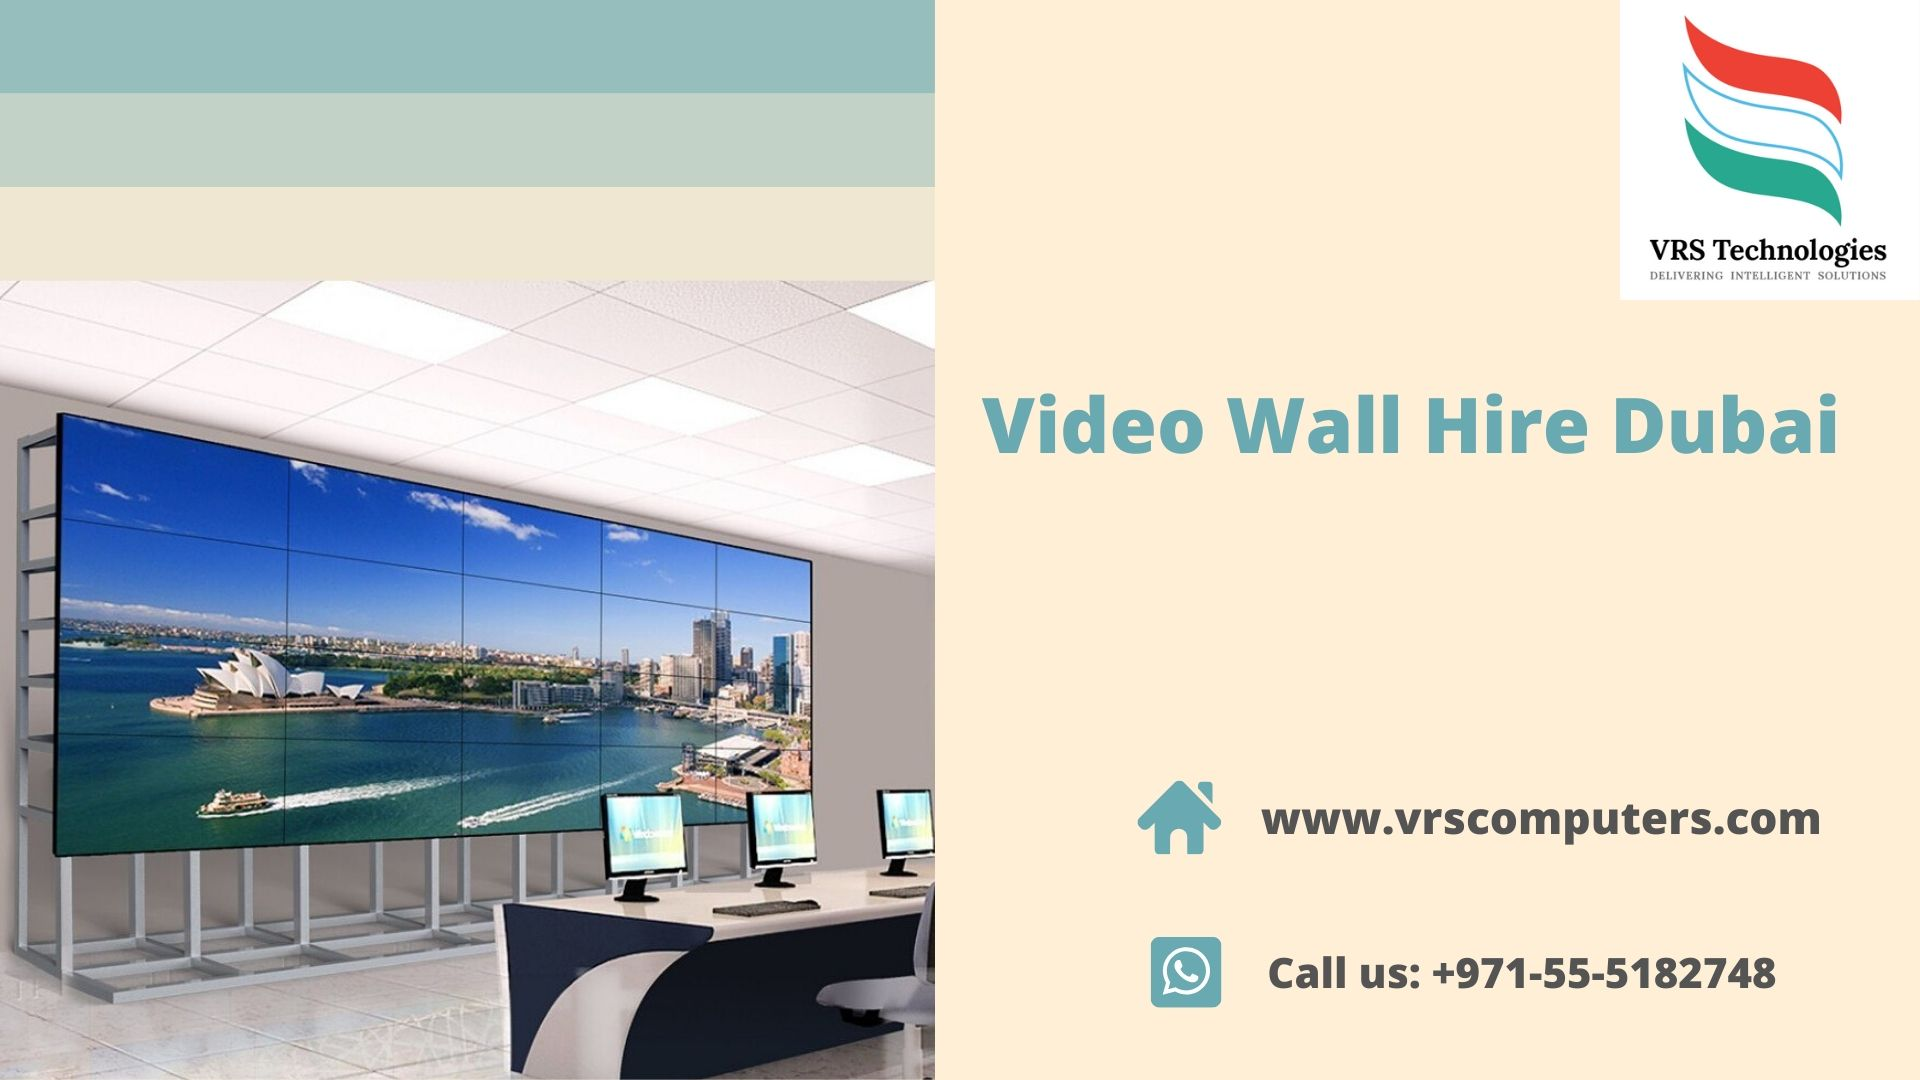 video-wall-rental-at-vrs-technologies-in-dubai